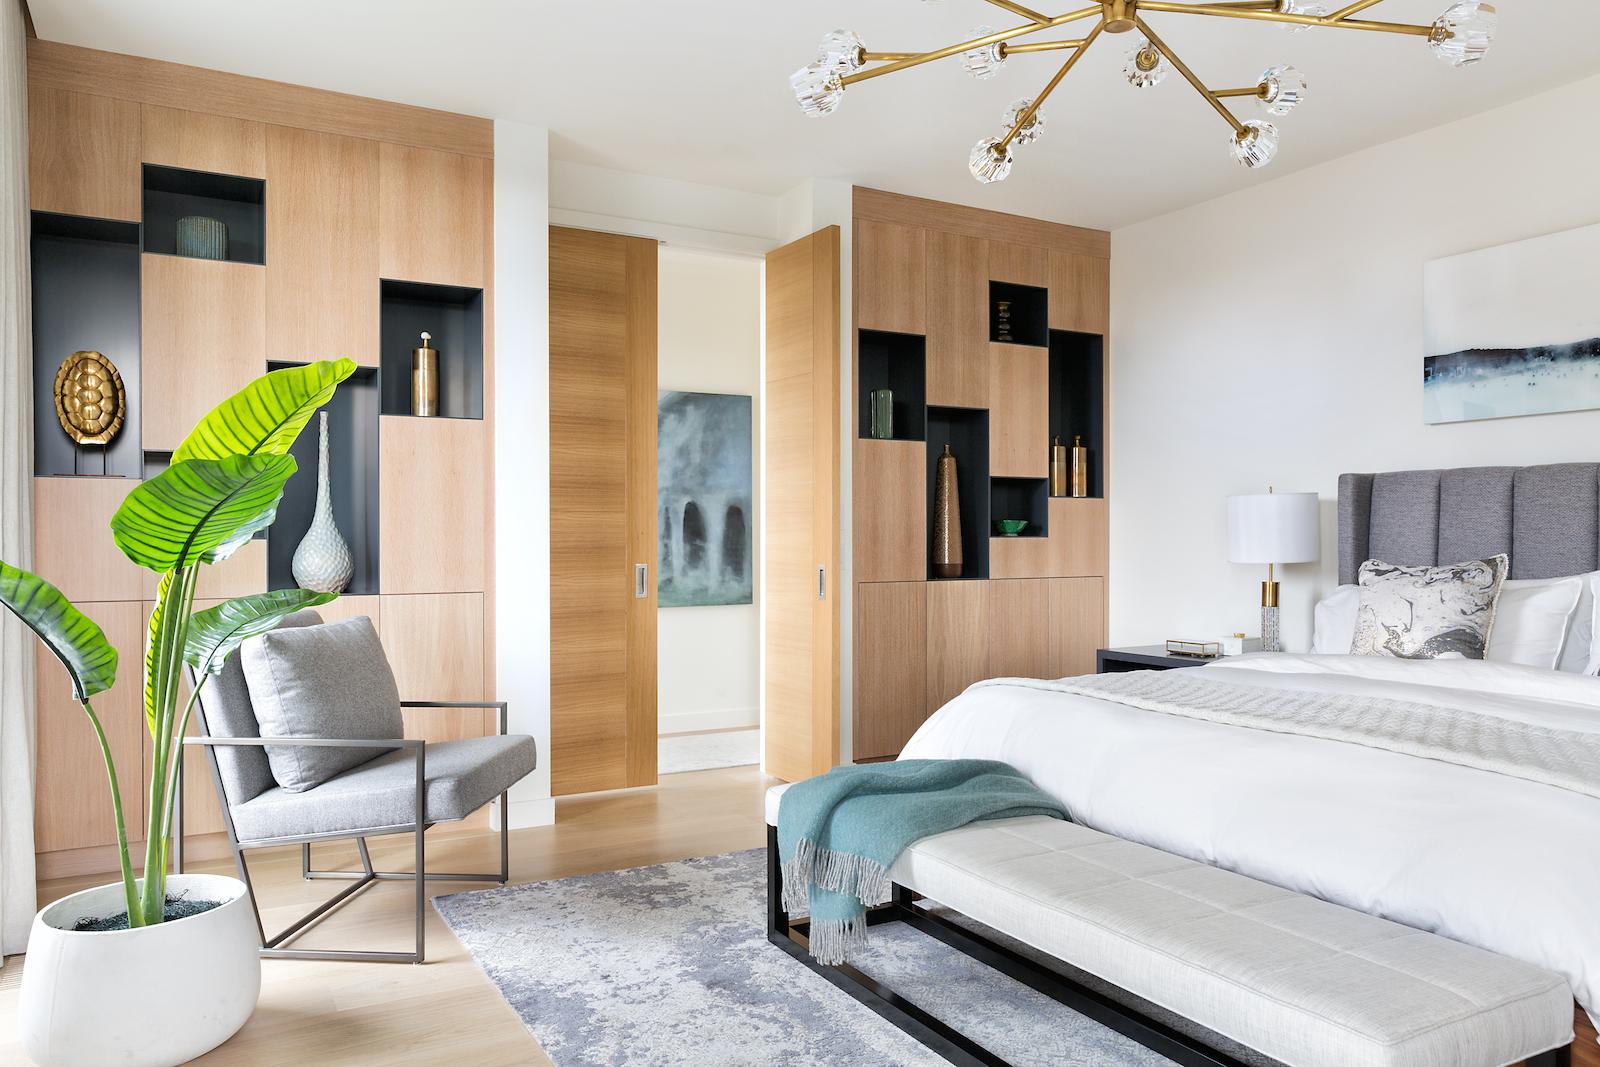 Elbow Park Modern, Master Bedroom, Calgary Interior Designer, Nyla Free Designs, DeJong Design Associates, Insignia Custom Builder, Phil Crozier Photography